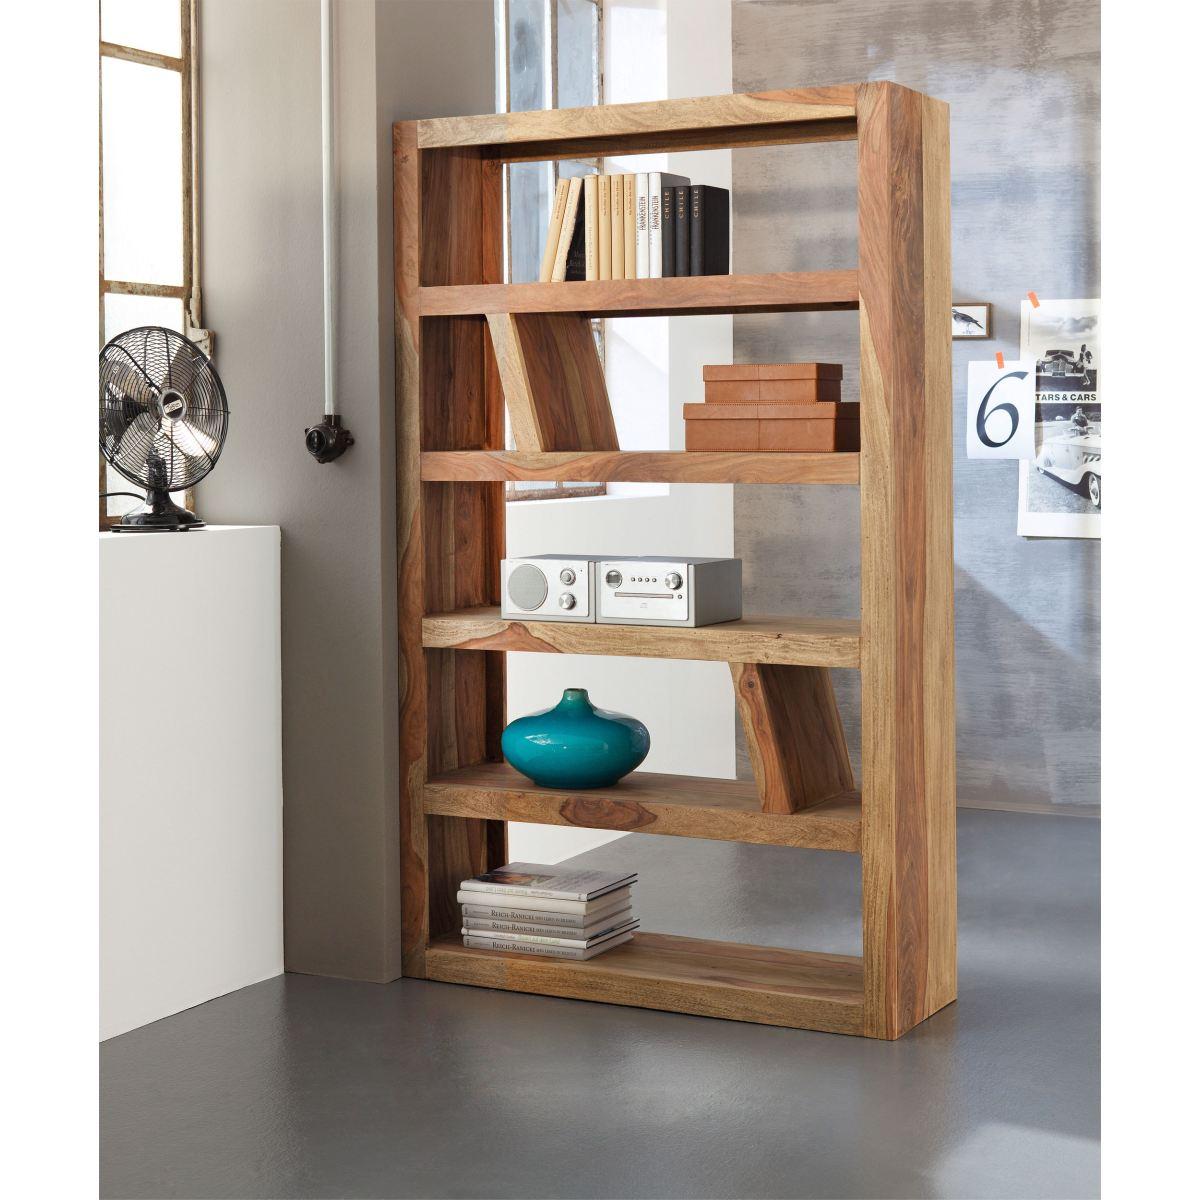 eleganter raumteiler yoga porta porta onlineshop. Black Bedroom Furniture Sets. Home Design Ideas